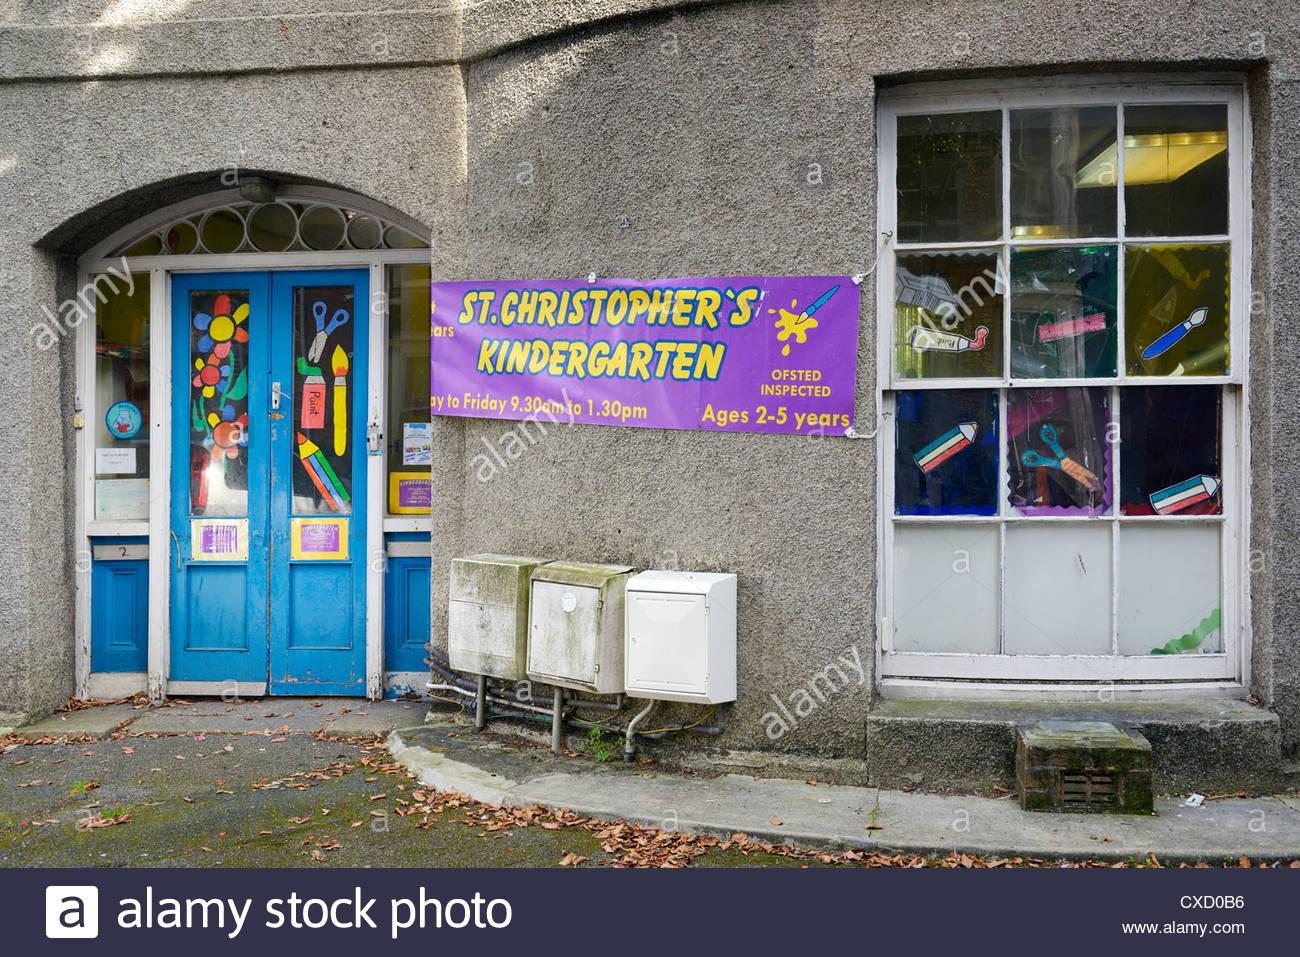 St Christopher's Kindergarten, Street-An-Pol, St Ives, Cornwall, England - Stock Image